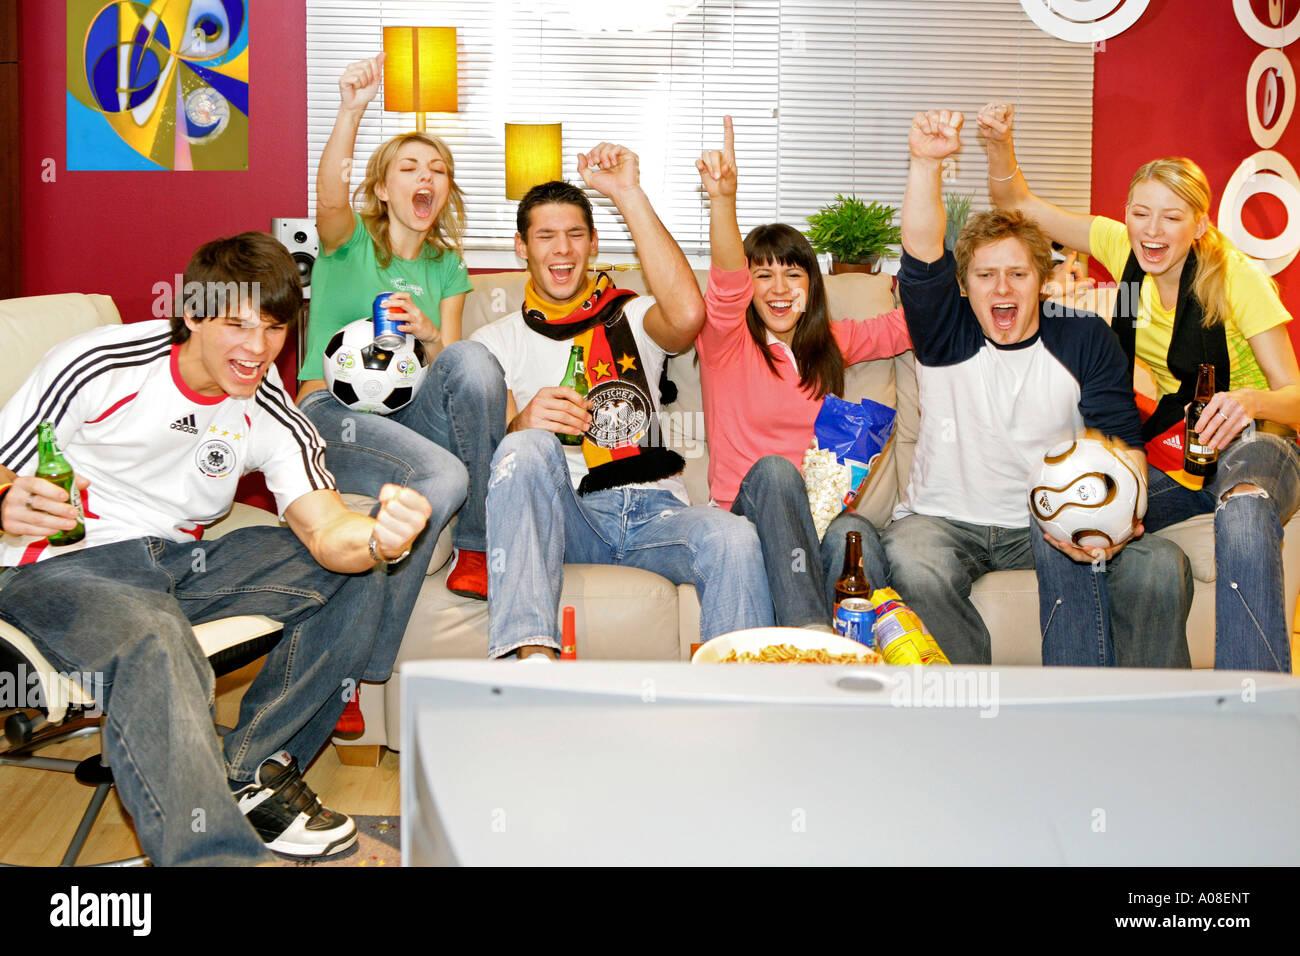 Fussballfans fiebern am Fernseher mit, football fans excited in front of tv - Stock Image